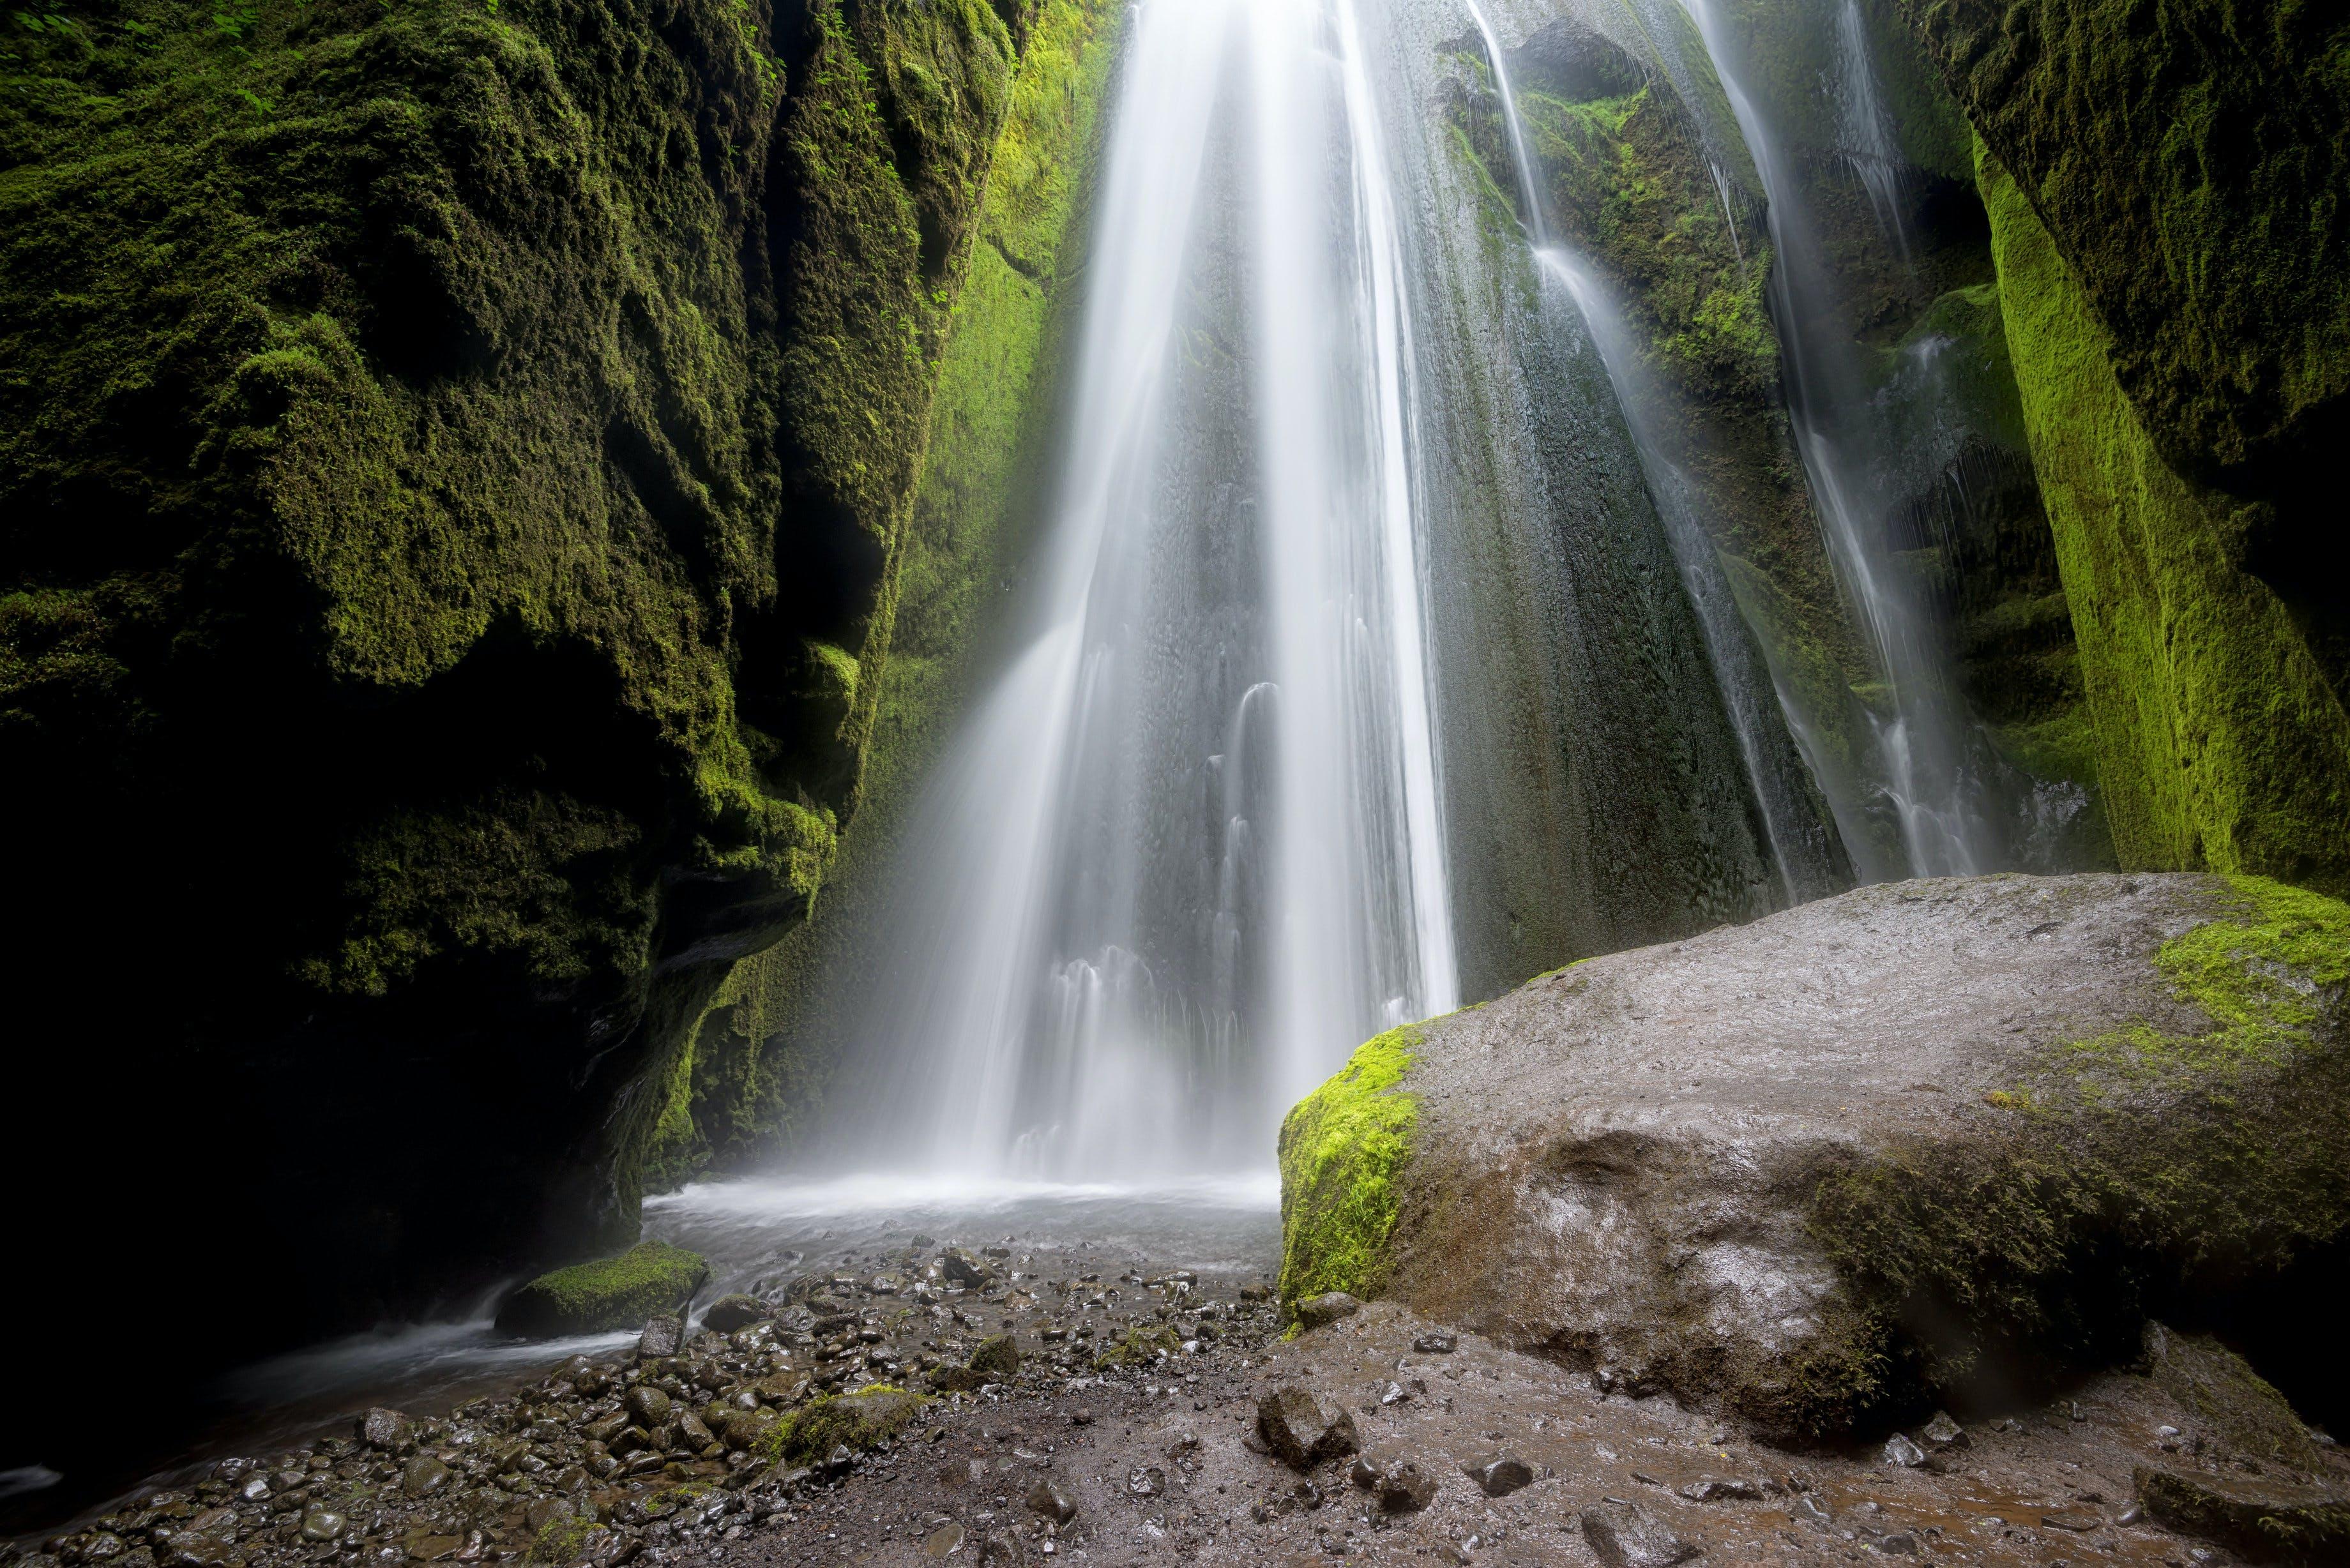 2 Day Tour to Jokulsarlon | With Glacier Hike, Waterfalls and Black Beach